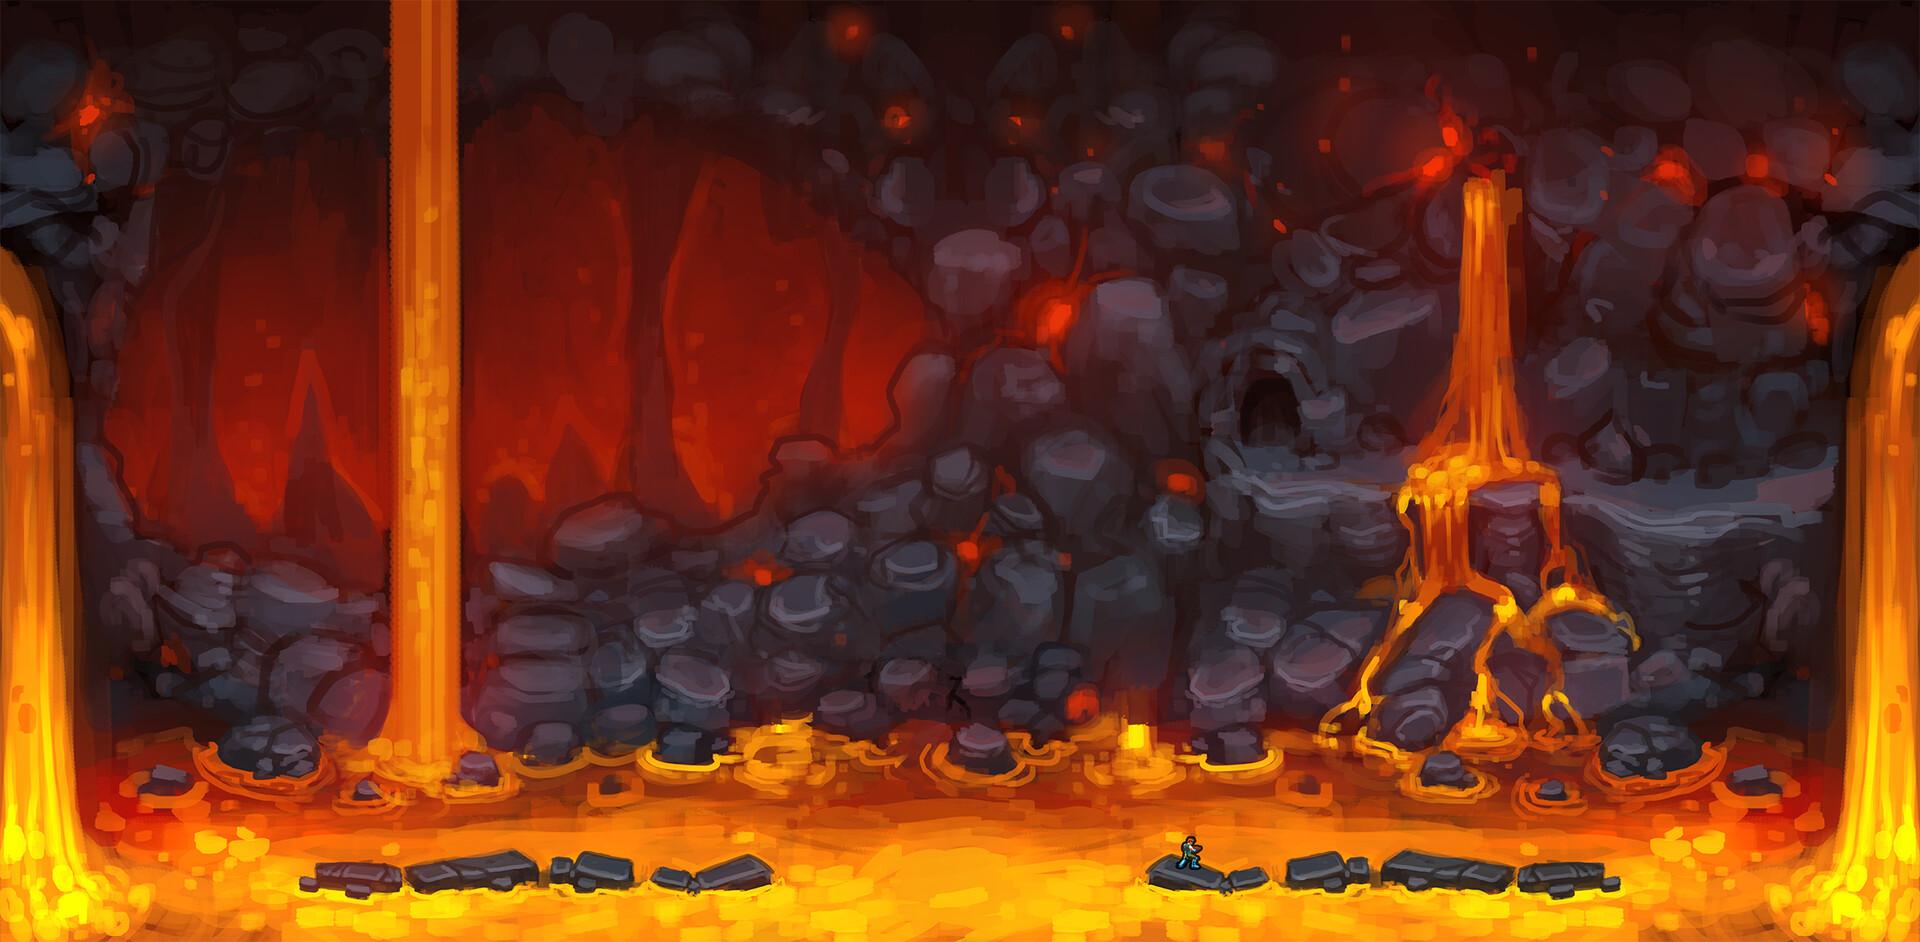 Daniel ribera olsen lava cave 01